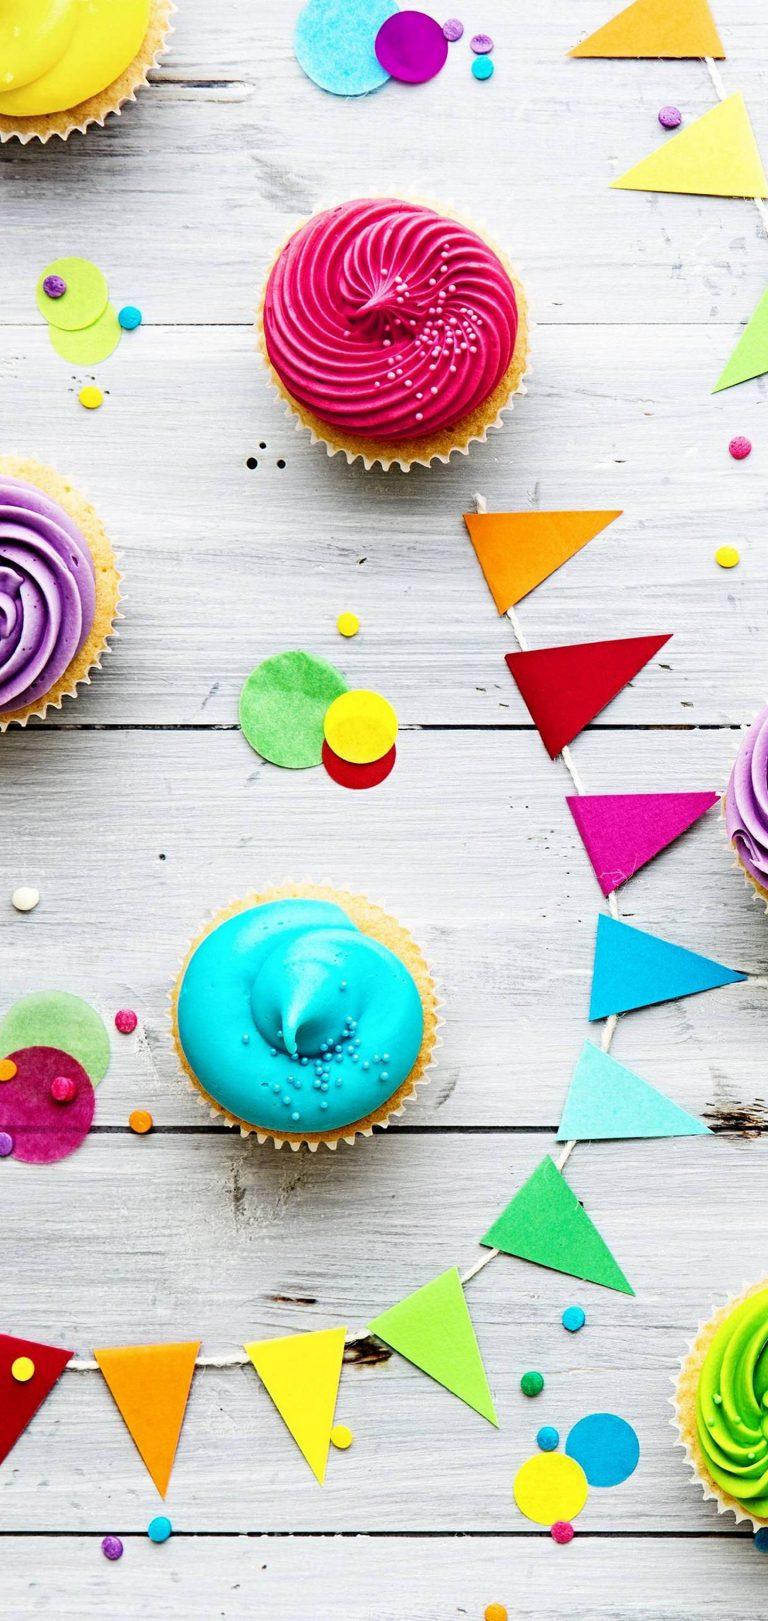 Food Cupcake Celebration Wallpaper 1440x3040 768x1621